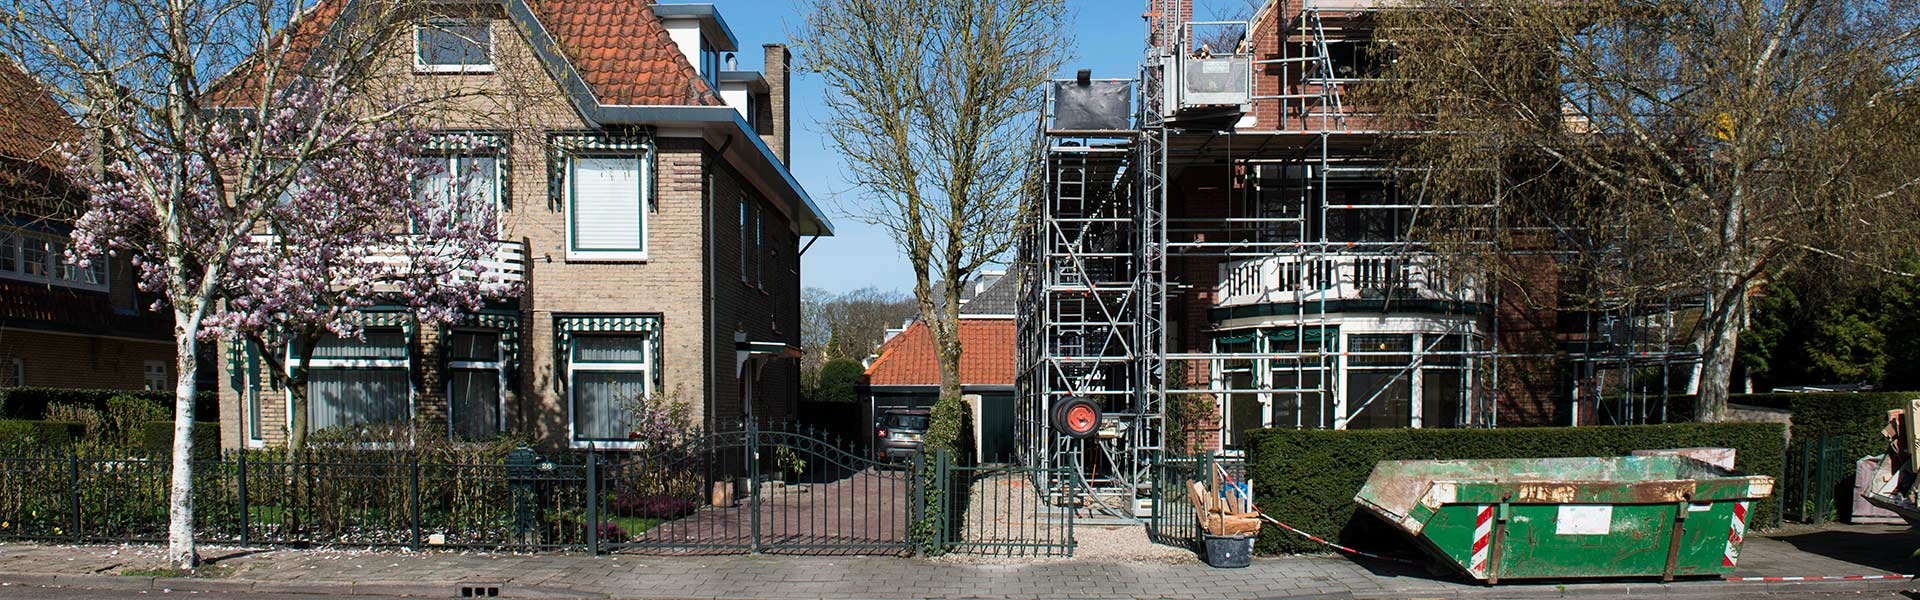 Steiger en bouwcontainer